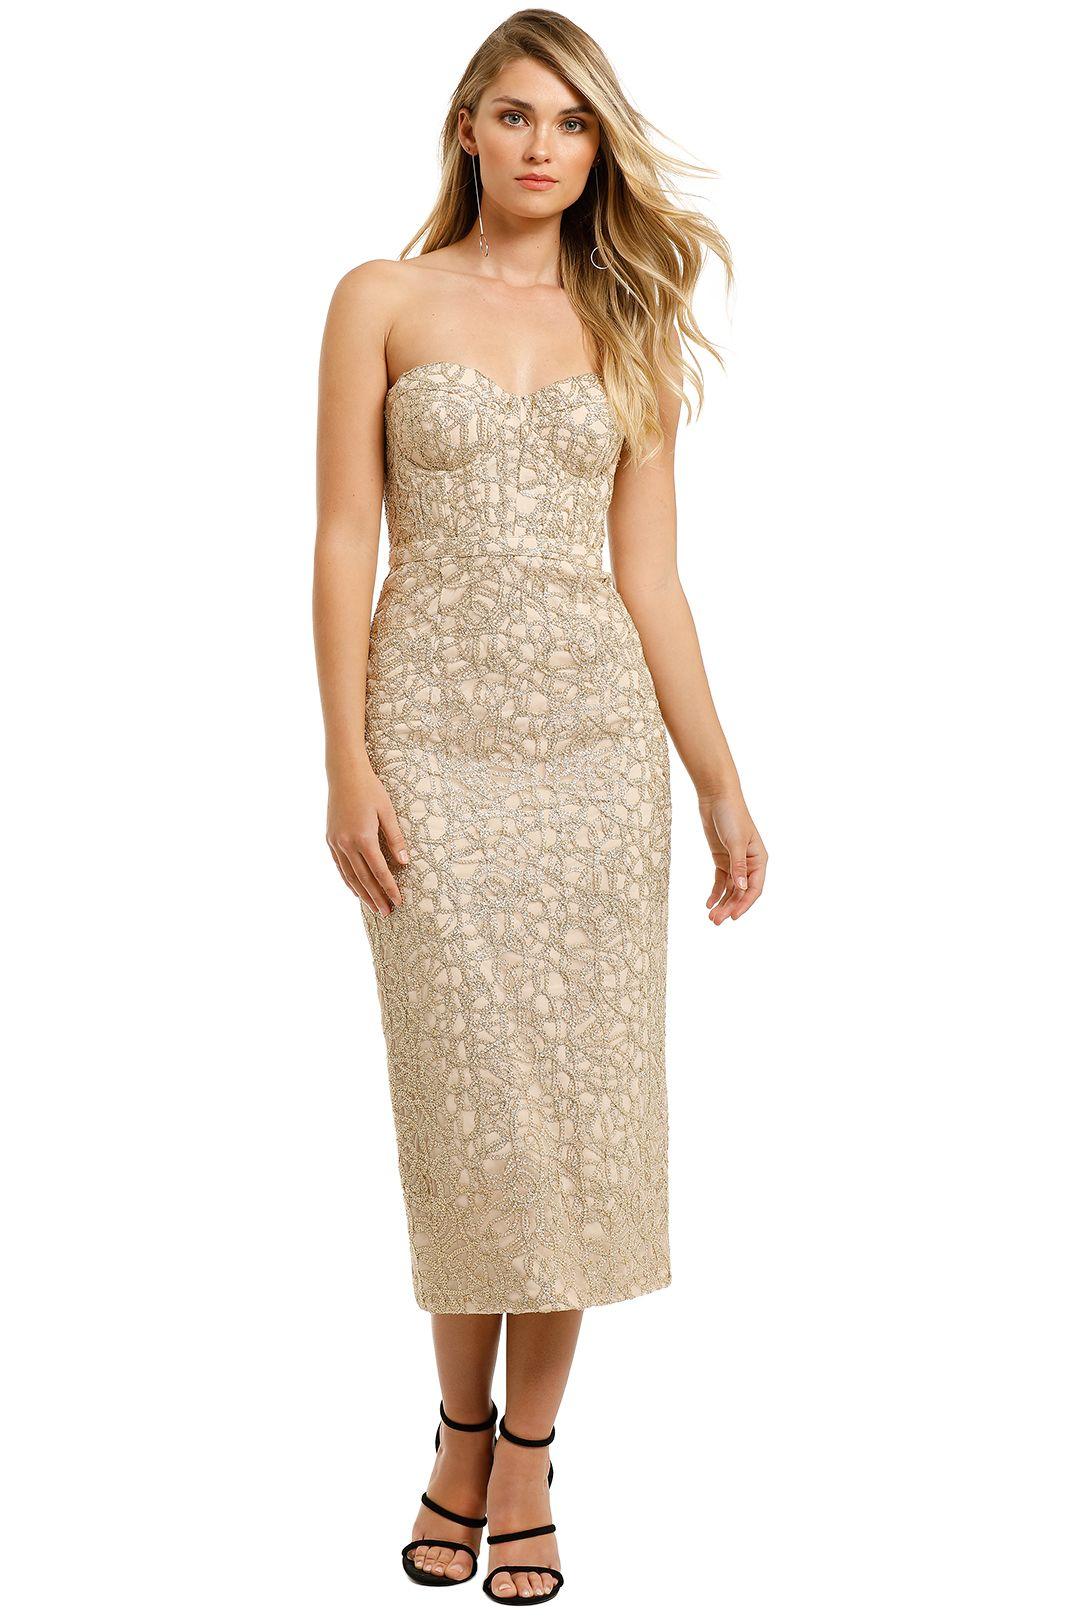 Elle-Zeitoune-Tailored-Dress-Featu-Front